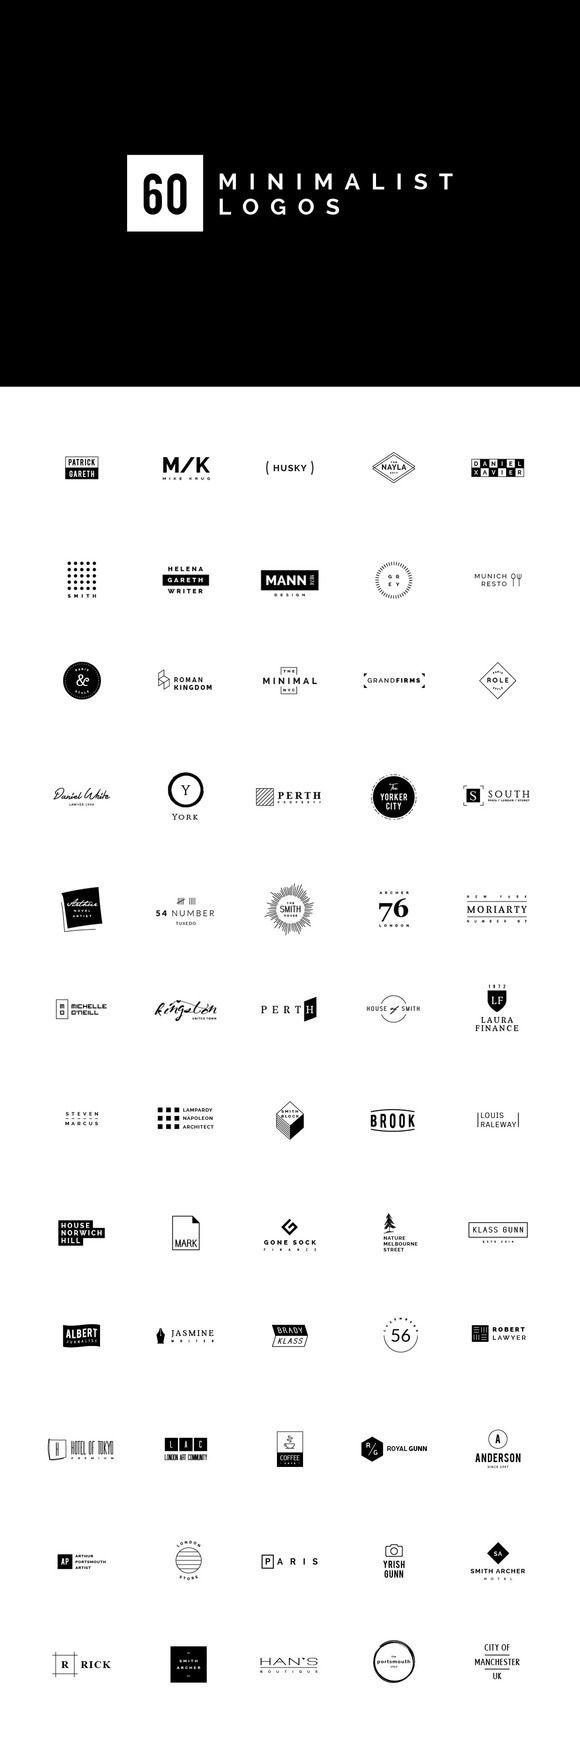 60 Minimalist Logos by vuuuds on Creative Market